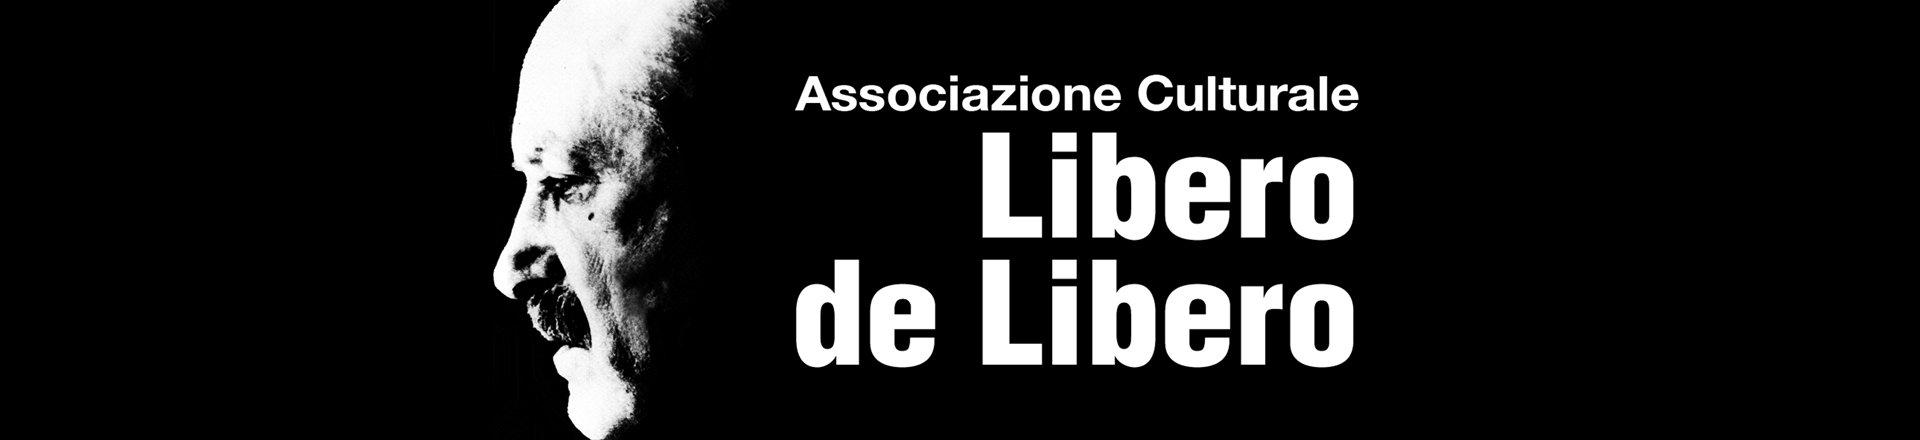 concorso letterario gratis